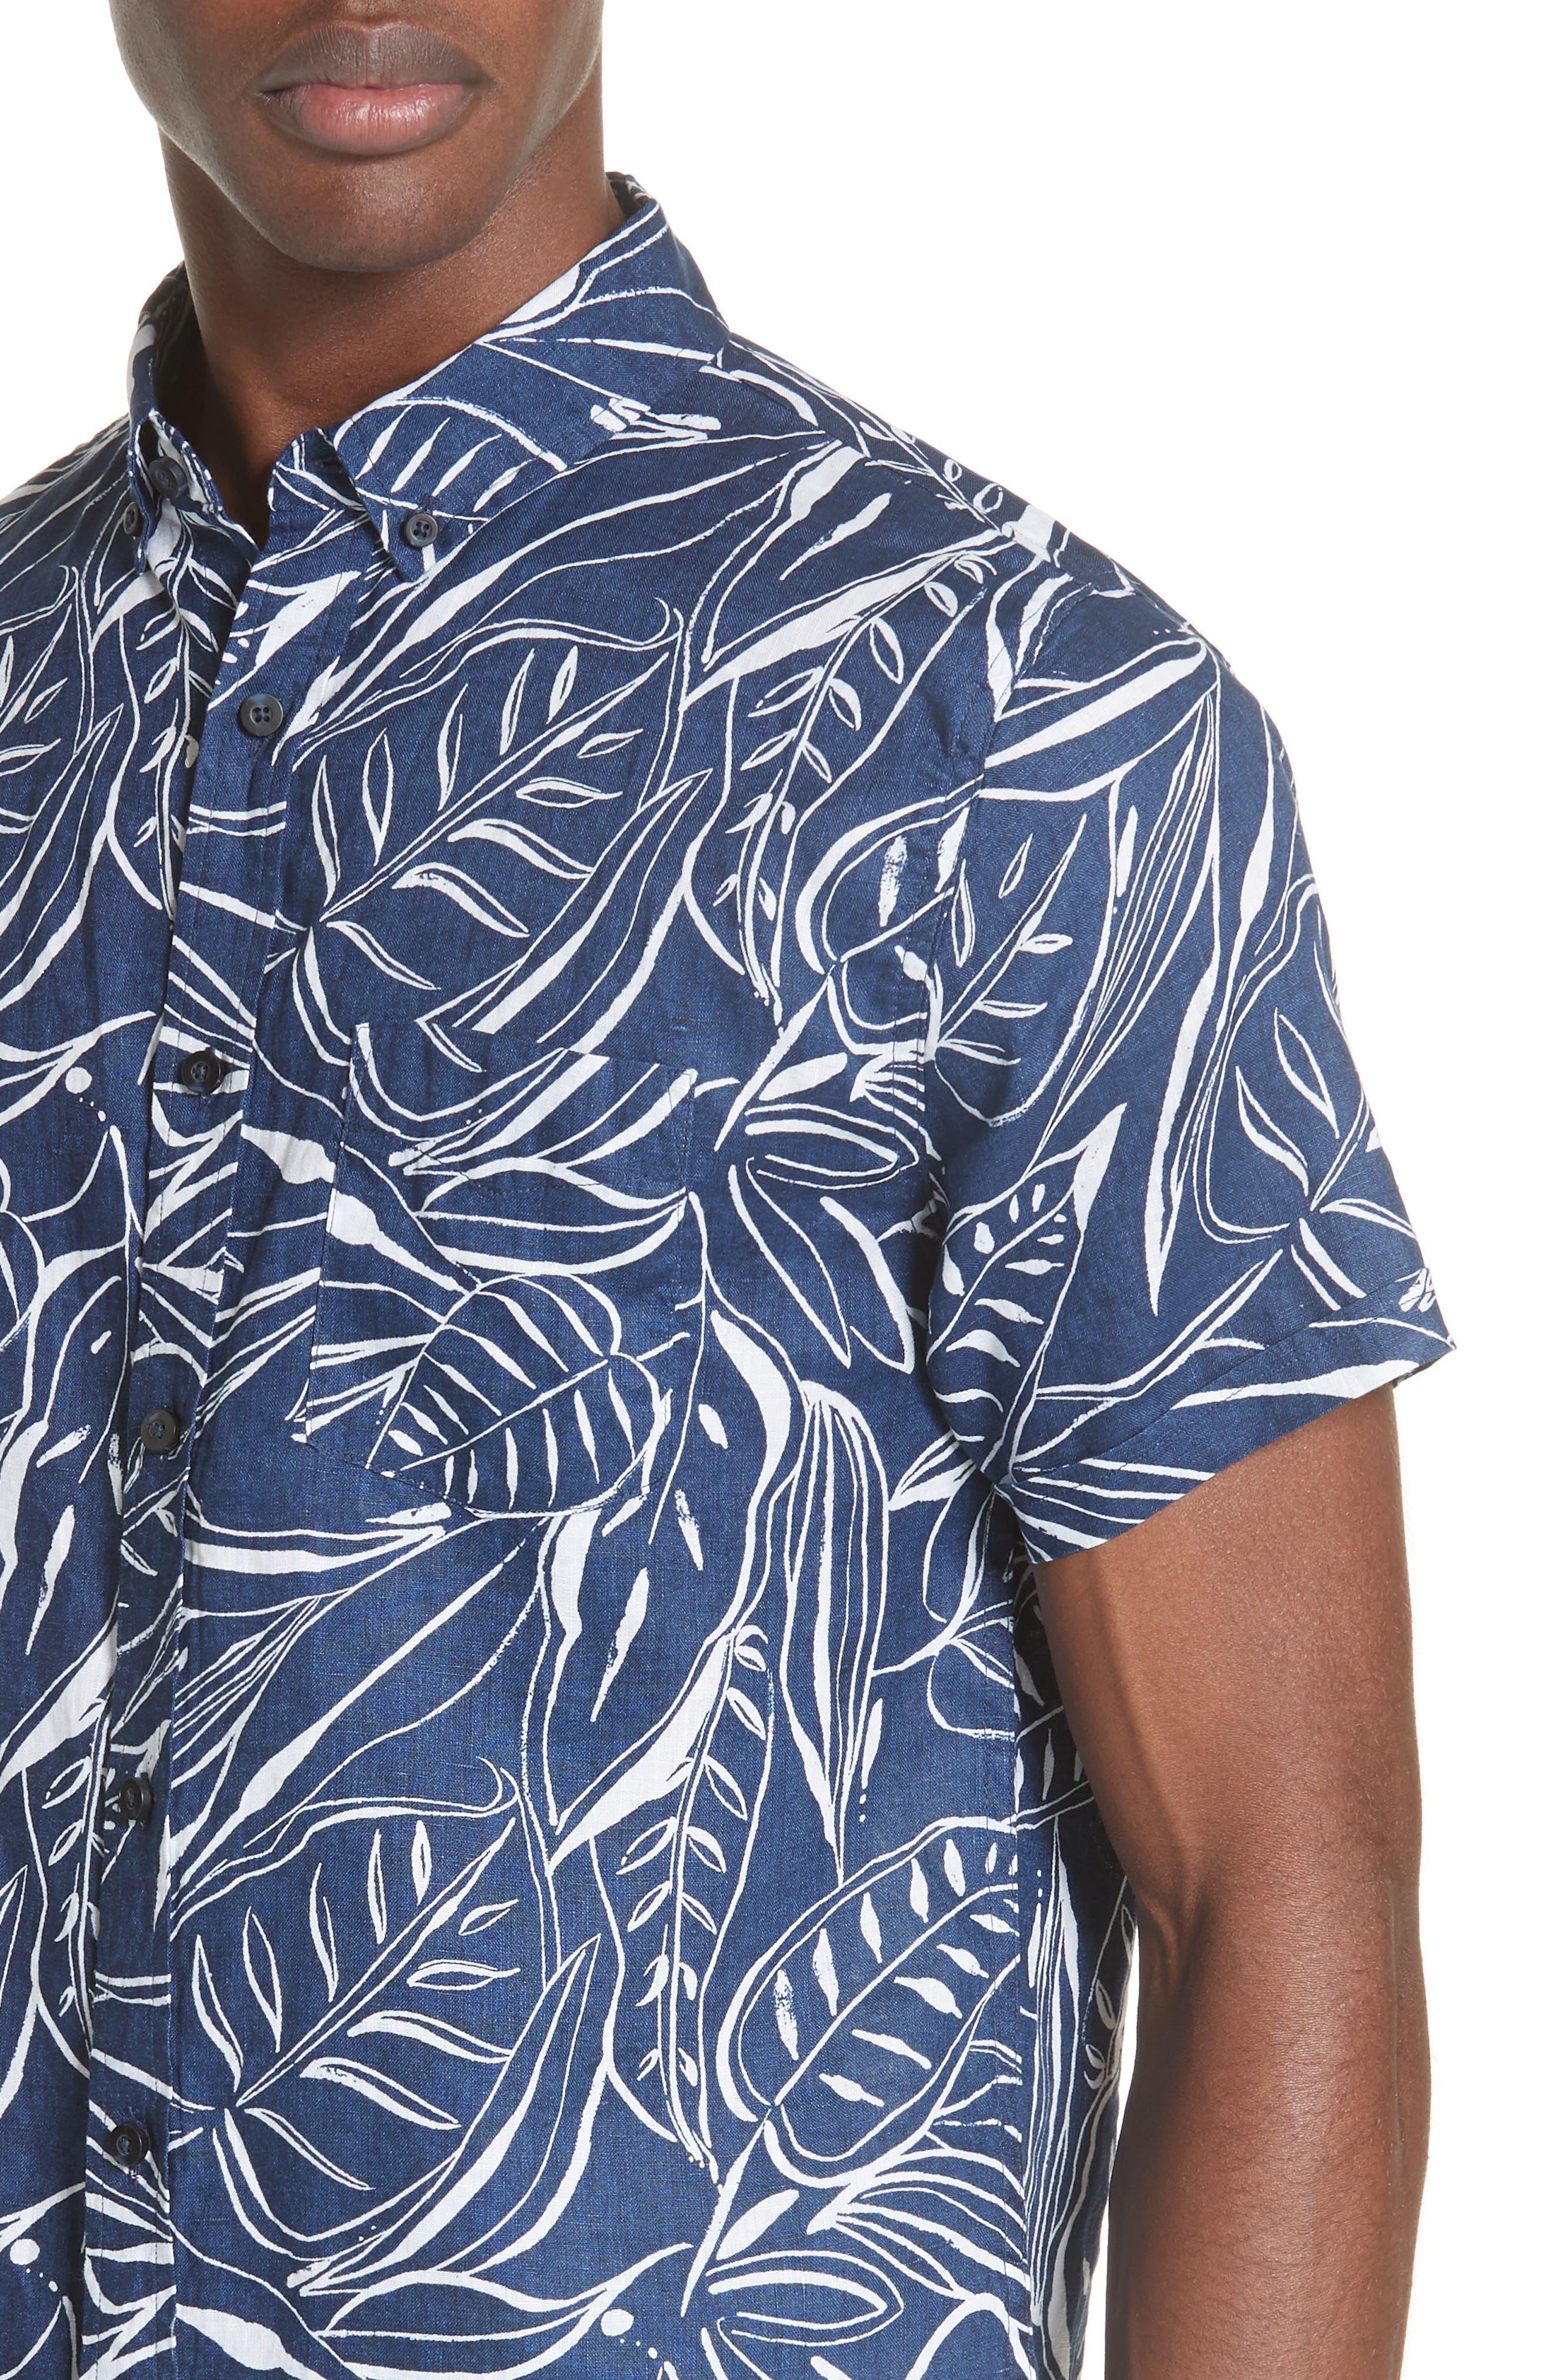 Jack Palm Print Linen Shirt,                             Alternate thumbnail 4, color,                             DEEP NAVY WHITE